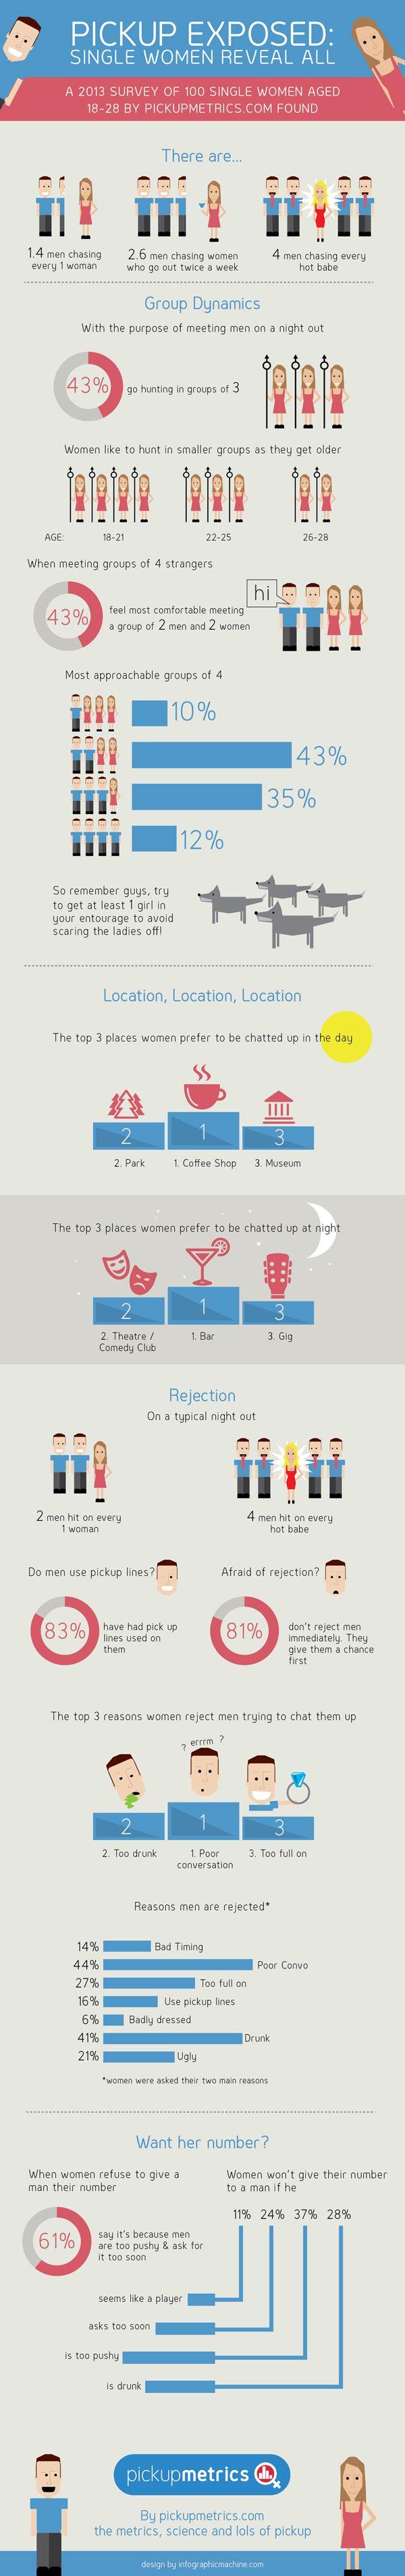 bartender dating sfaturi)